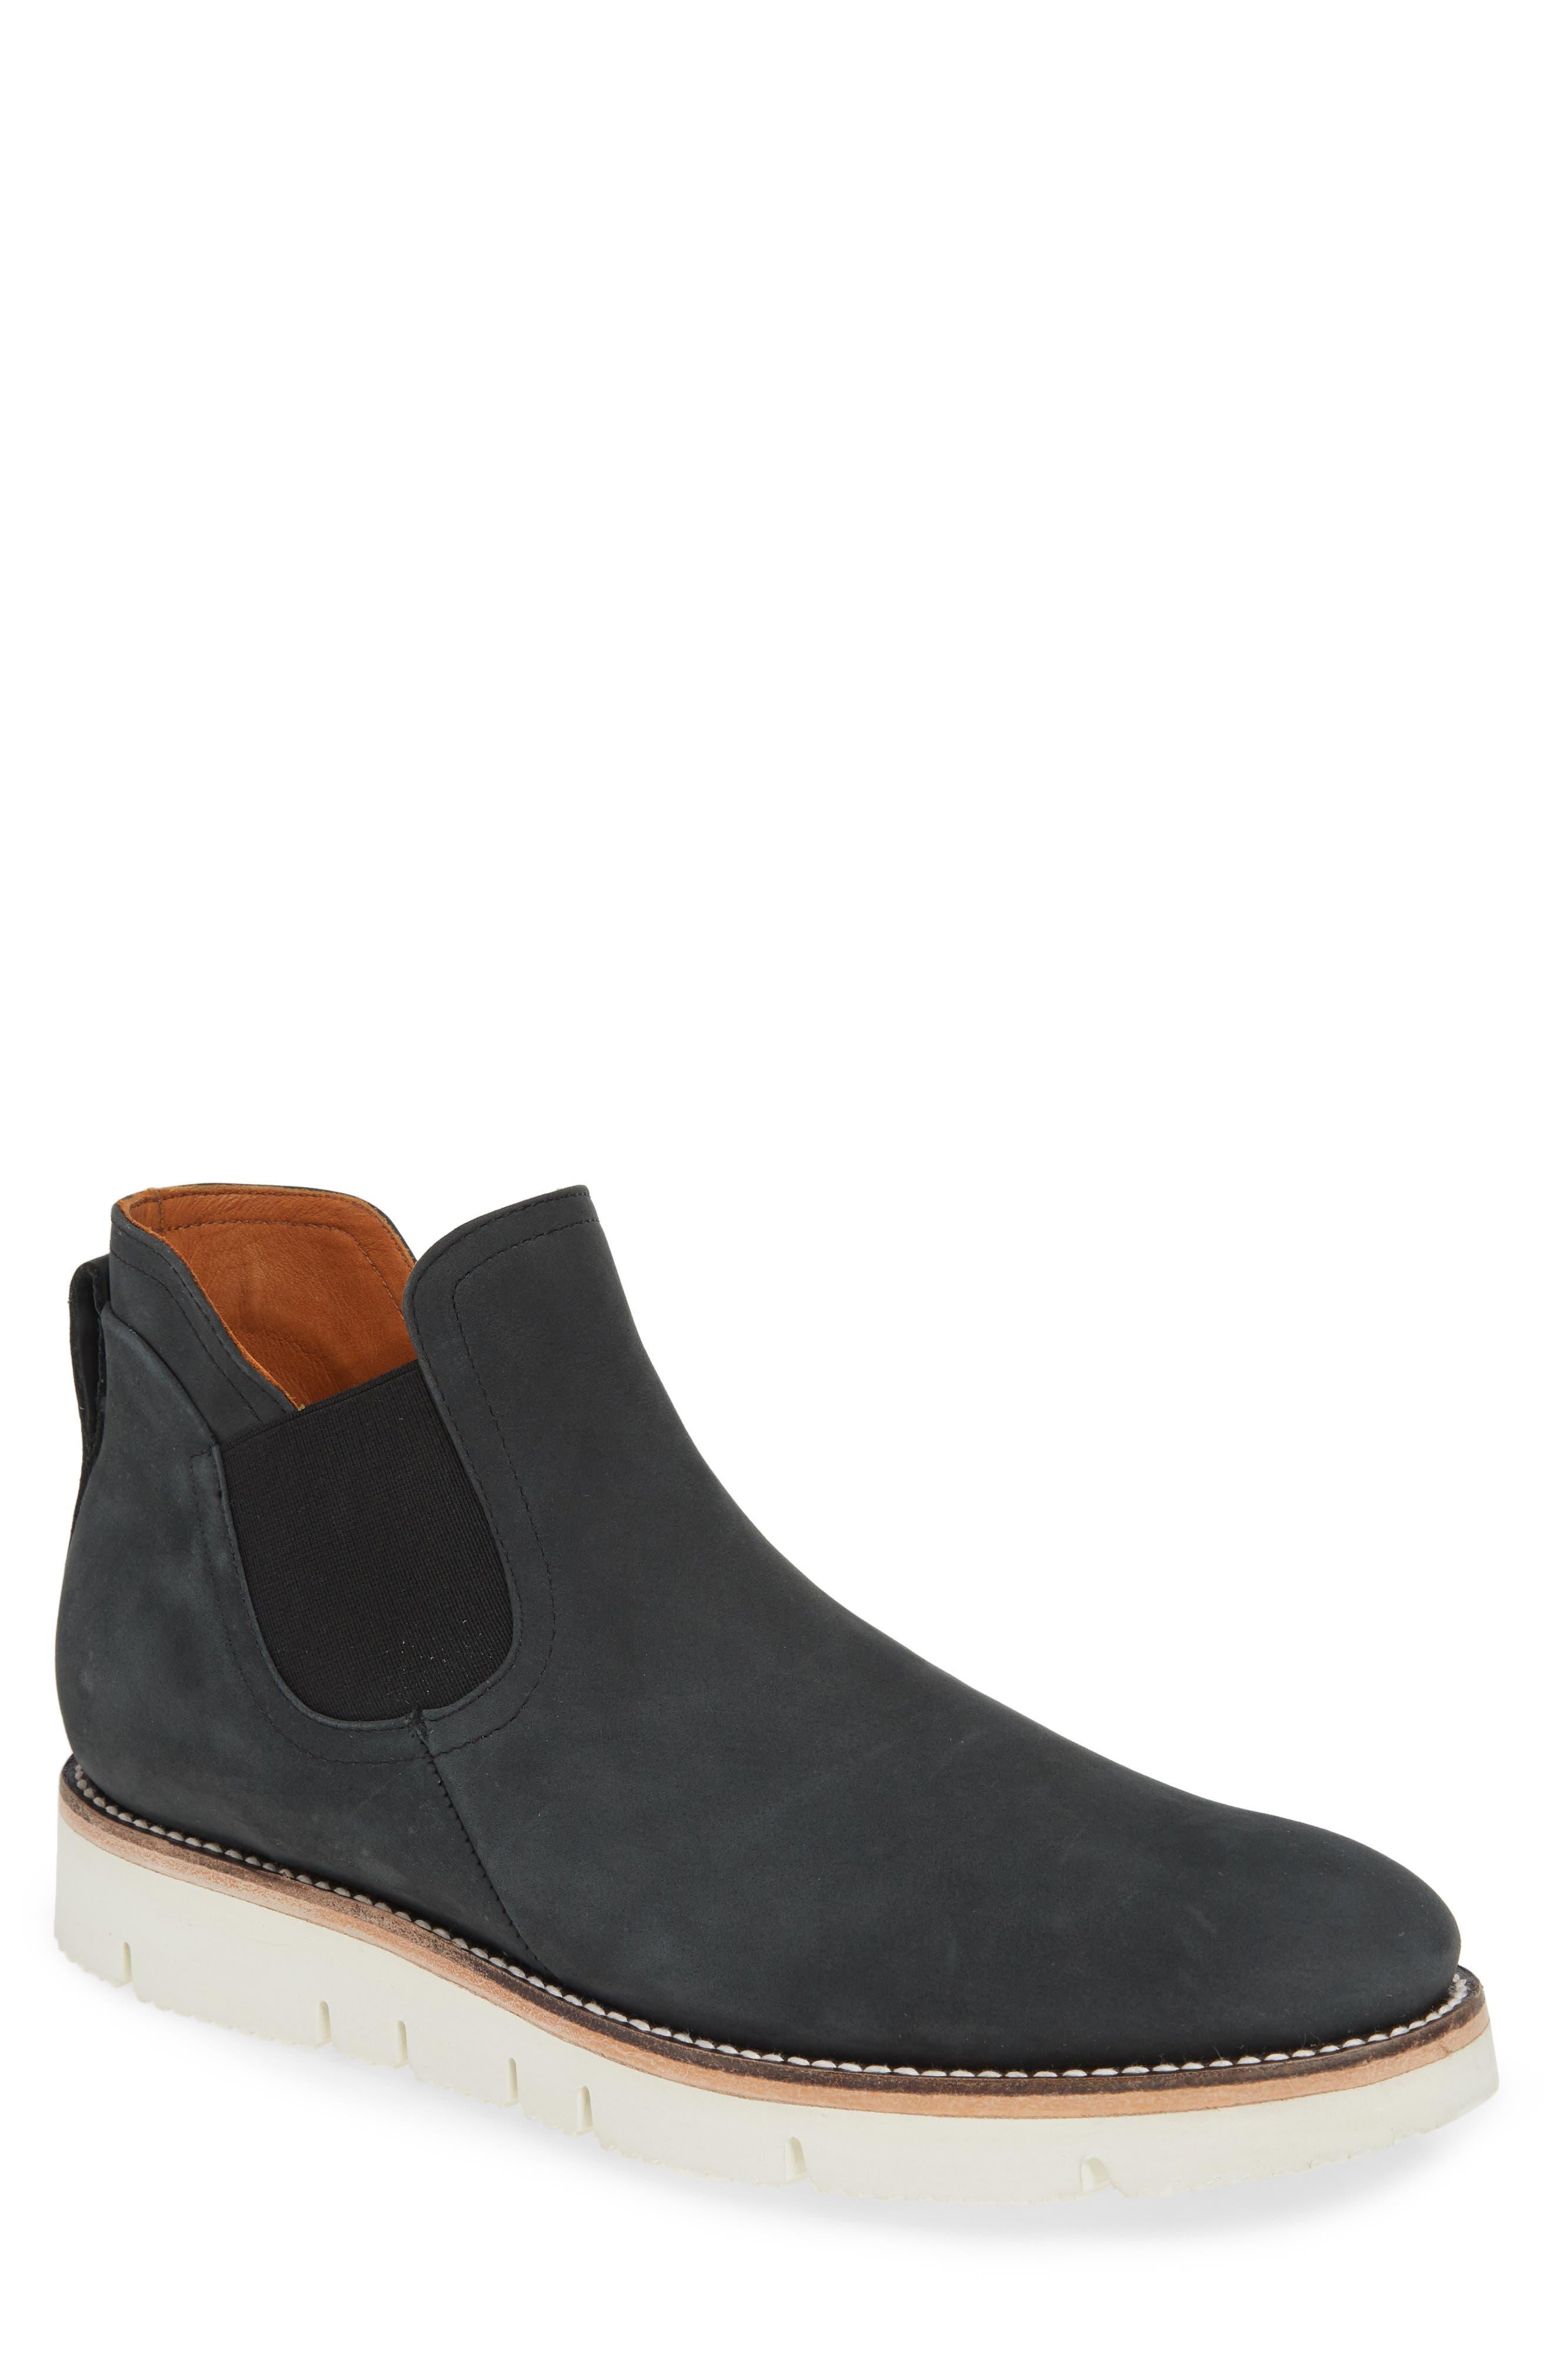 Ariat Uptown Mid Chelsea Boot, Grey